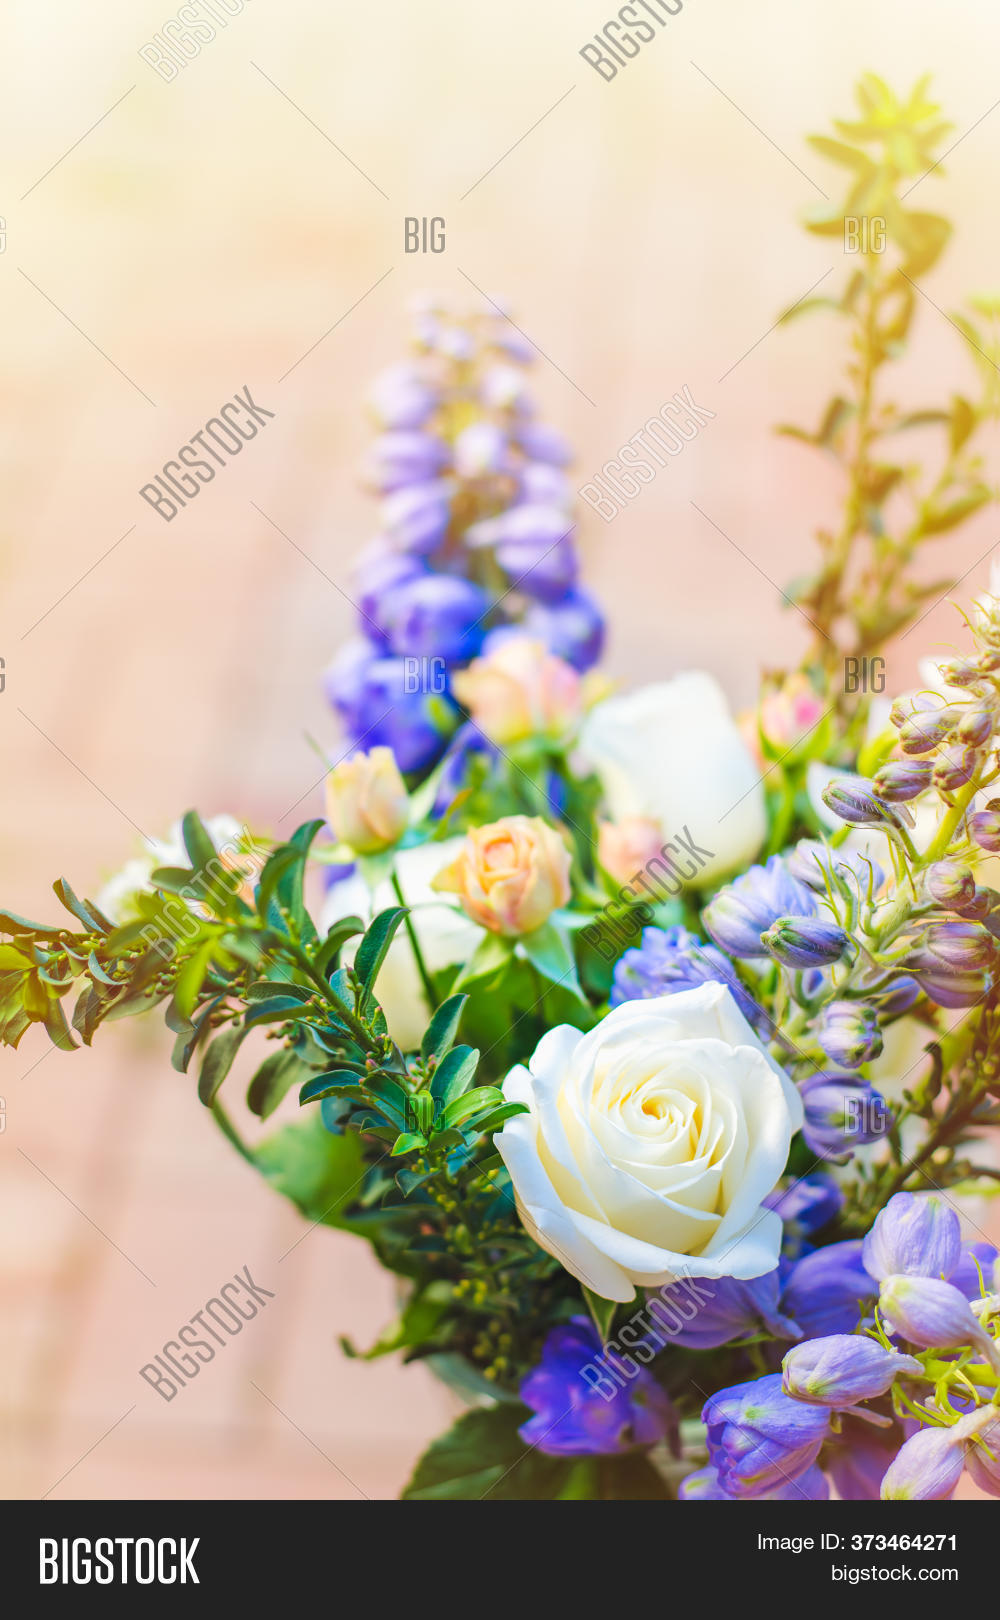 Flower Arrangement Image Photo Free Trial Bigstock